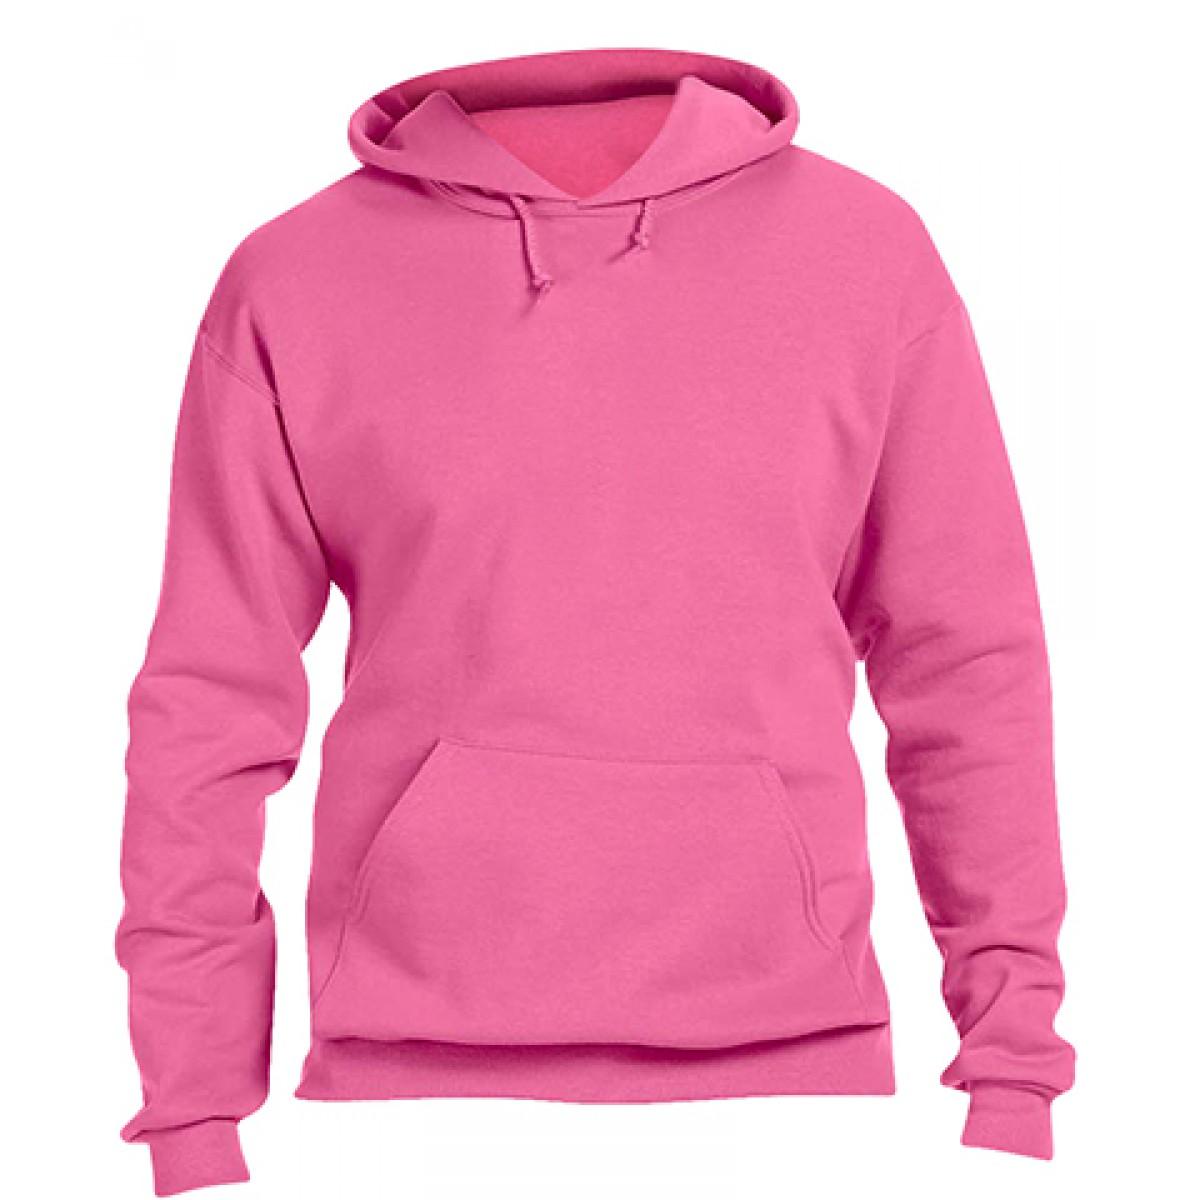 Pullover Hood 50/50 Preshrunk Fleece-Neon-Pink-XL